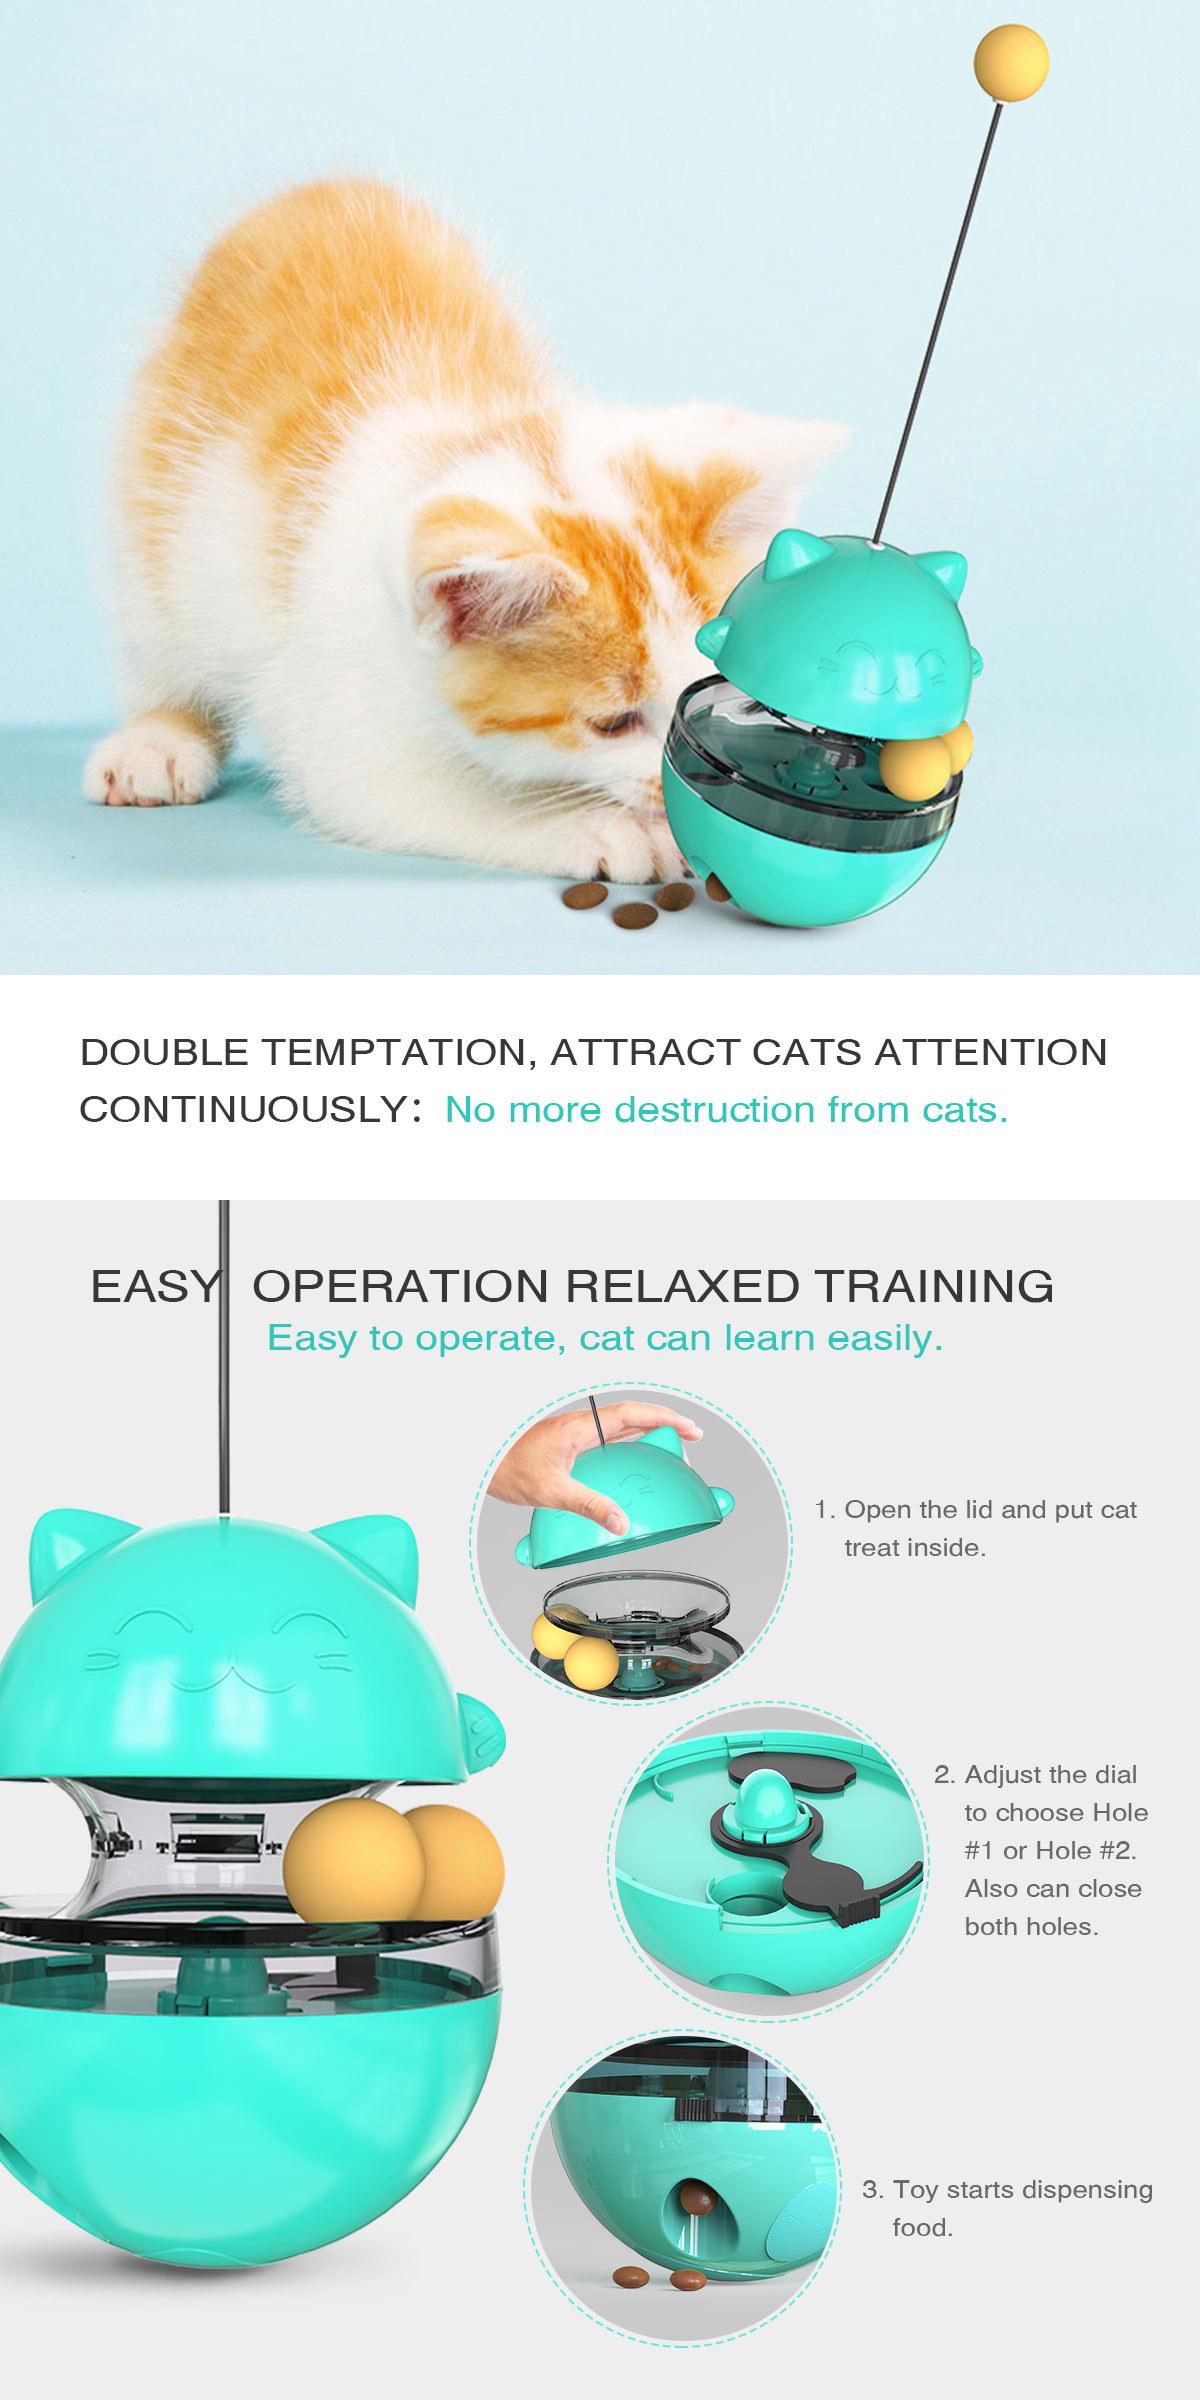 Pet Supplies Shake Cat Toy Teasing Cat Stick Teasing Artifact Track Ball Does Not Spill Food Ball MOQ 30 PCS 2